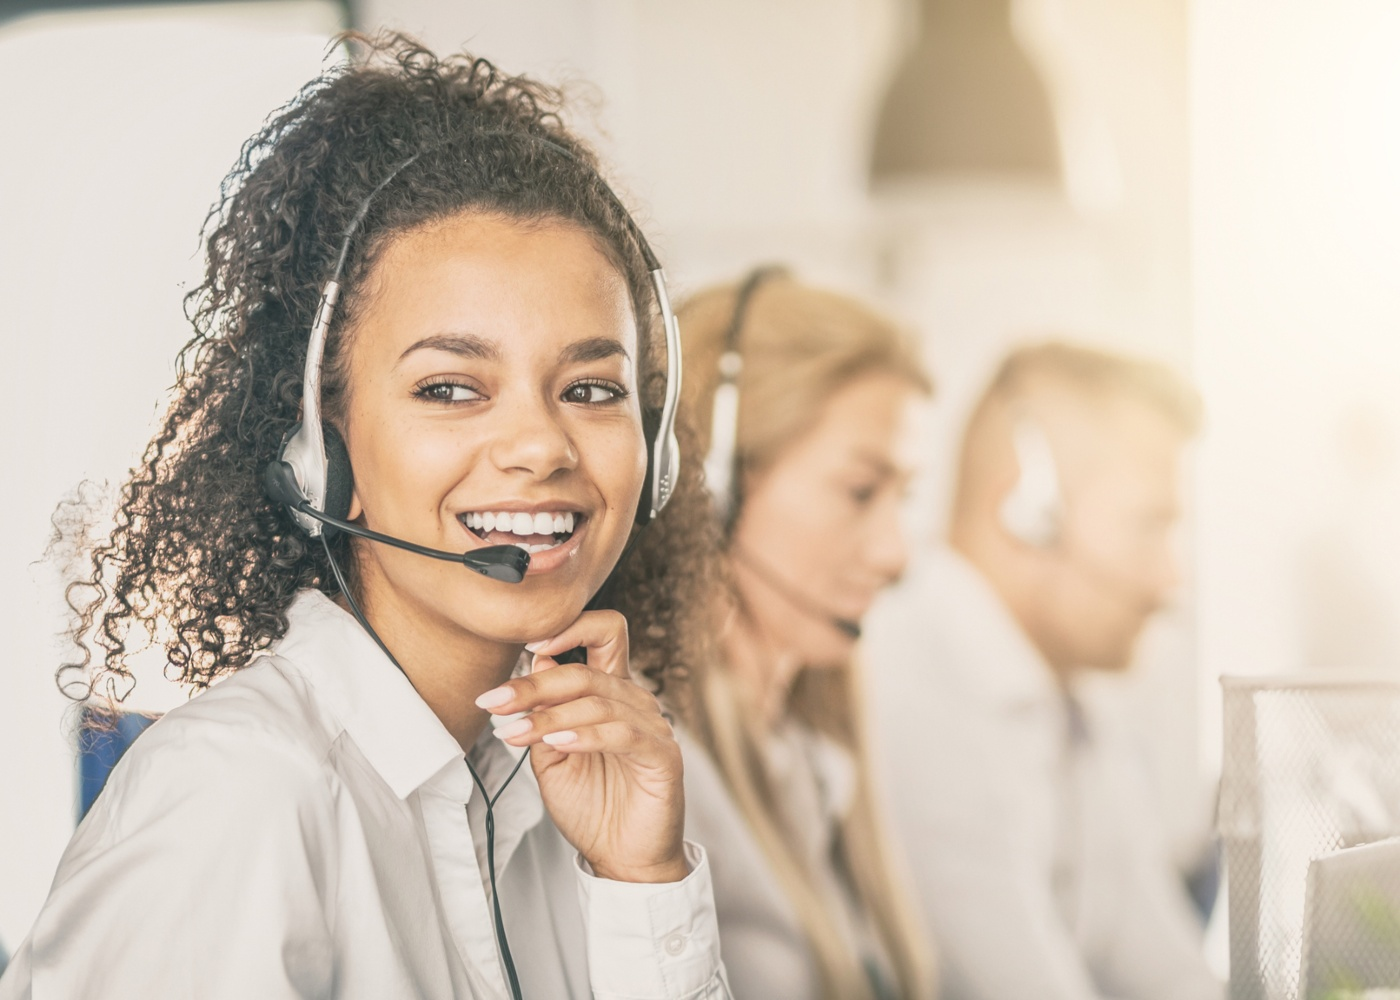 colaboradora call center